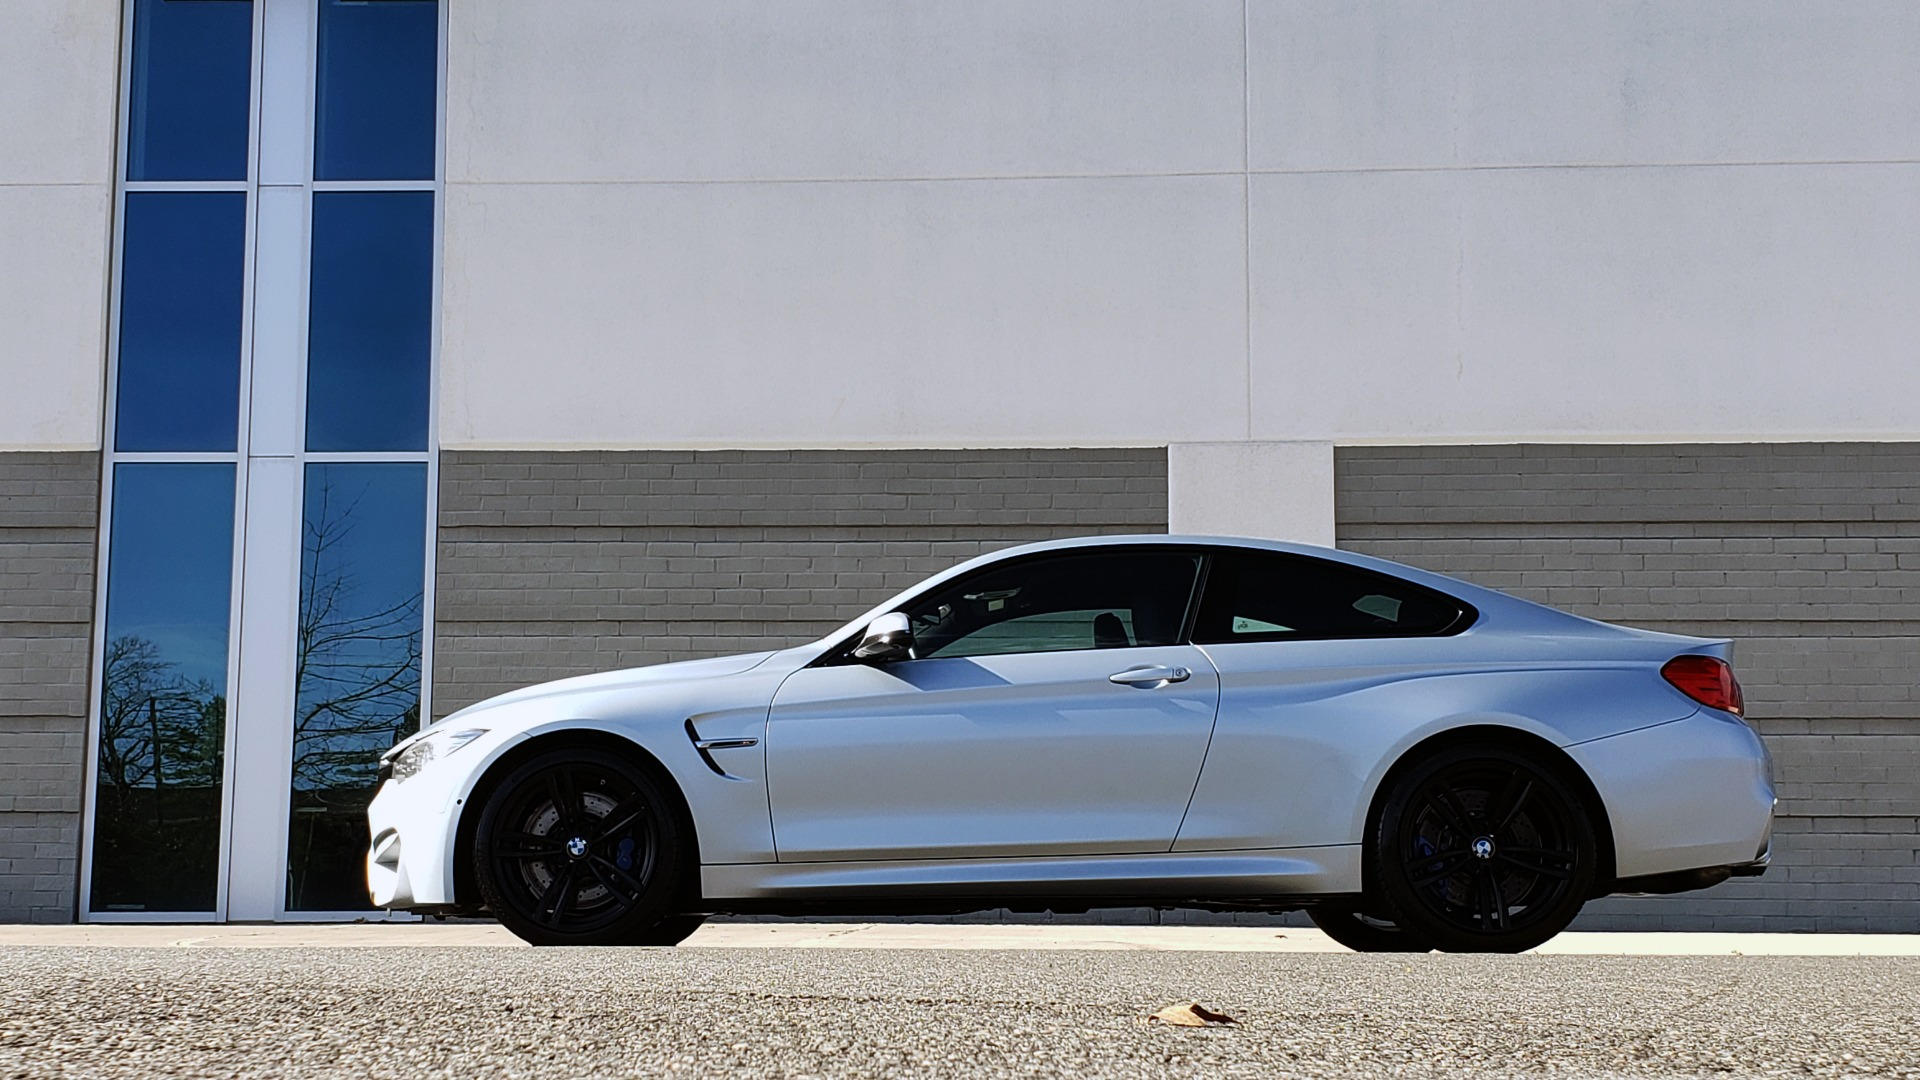 Used 2015 BMW M4 COUPE / EXEC PKG / DRVR ASST PLUS / LIGHTING / M-SUSPENSION for sale Sold at Formula Imports in Charlotte NC 28227 3